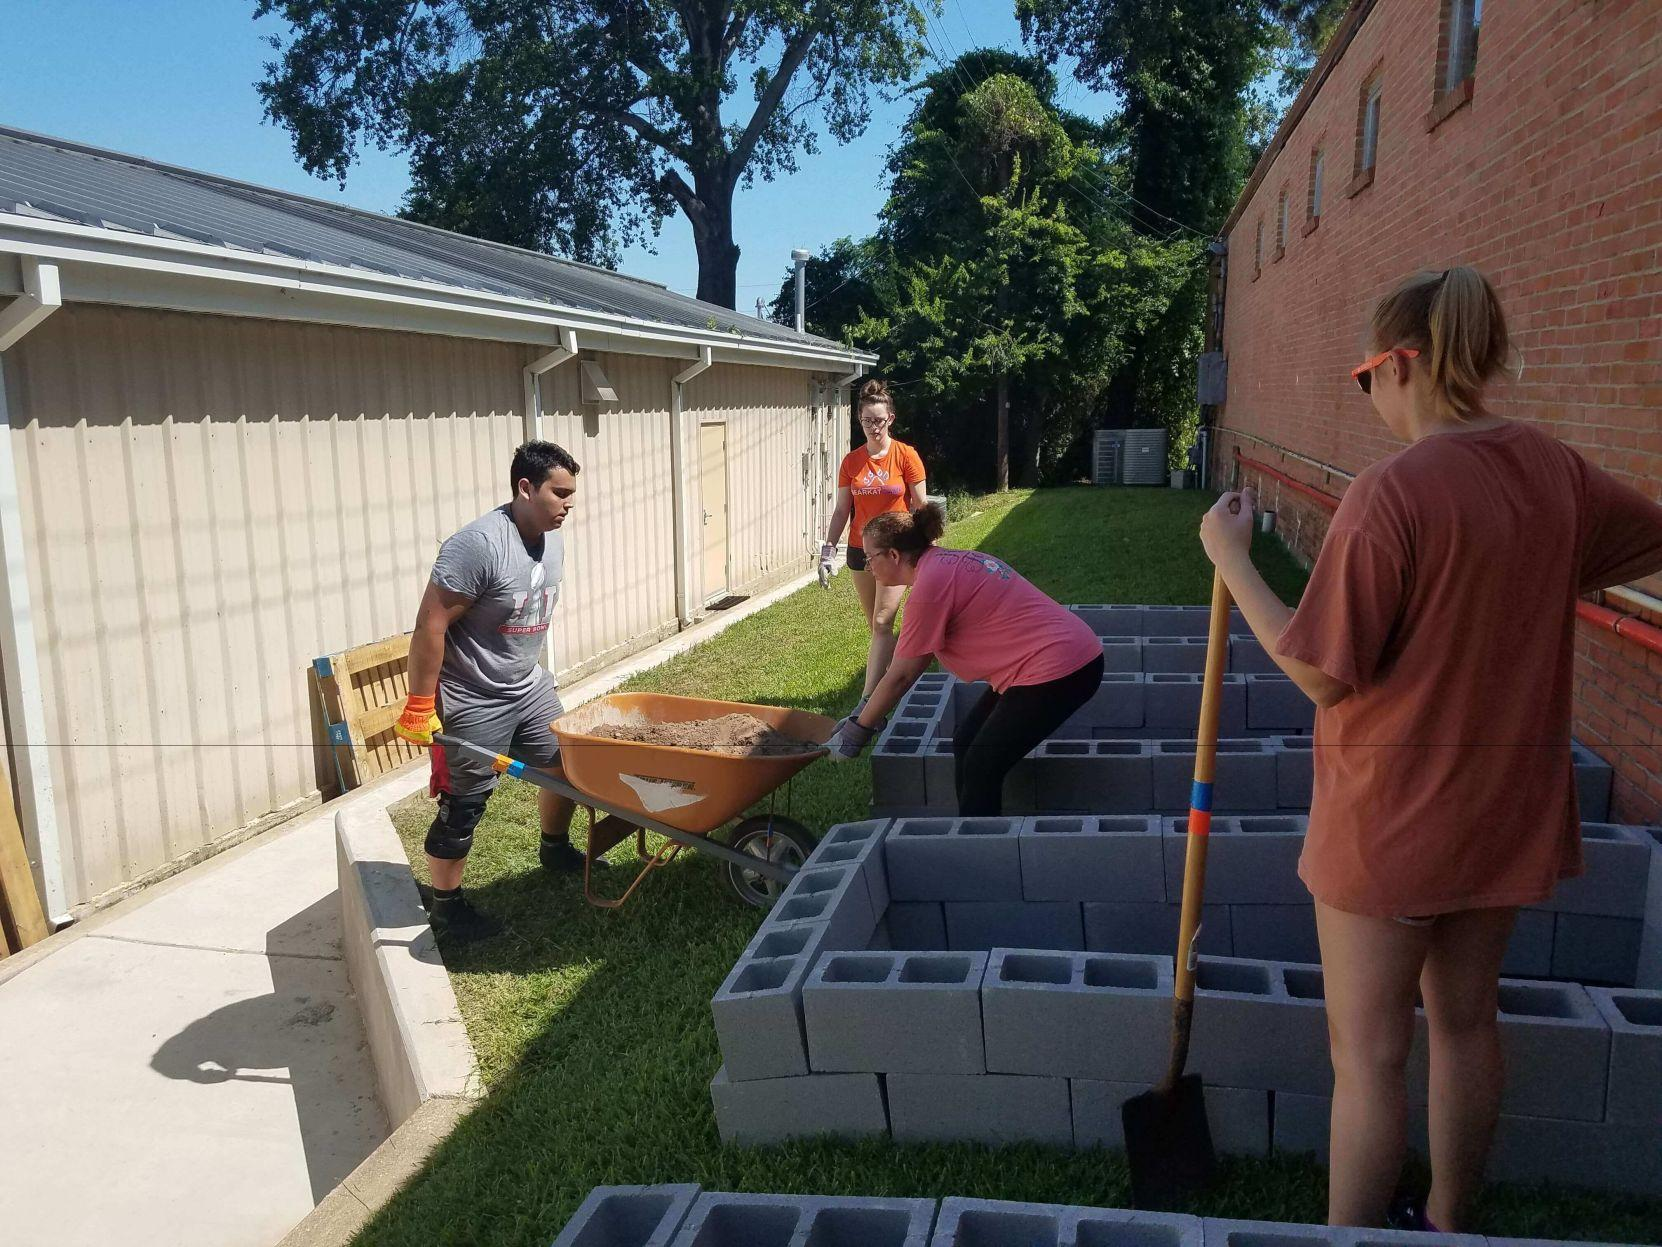 SHSU Food Pantry and Wesley Foundation join efforts to build vegetable garden